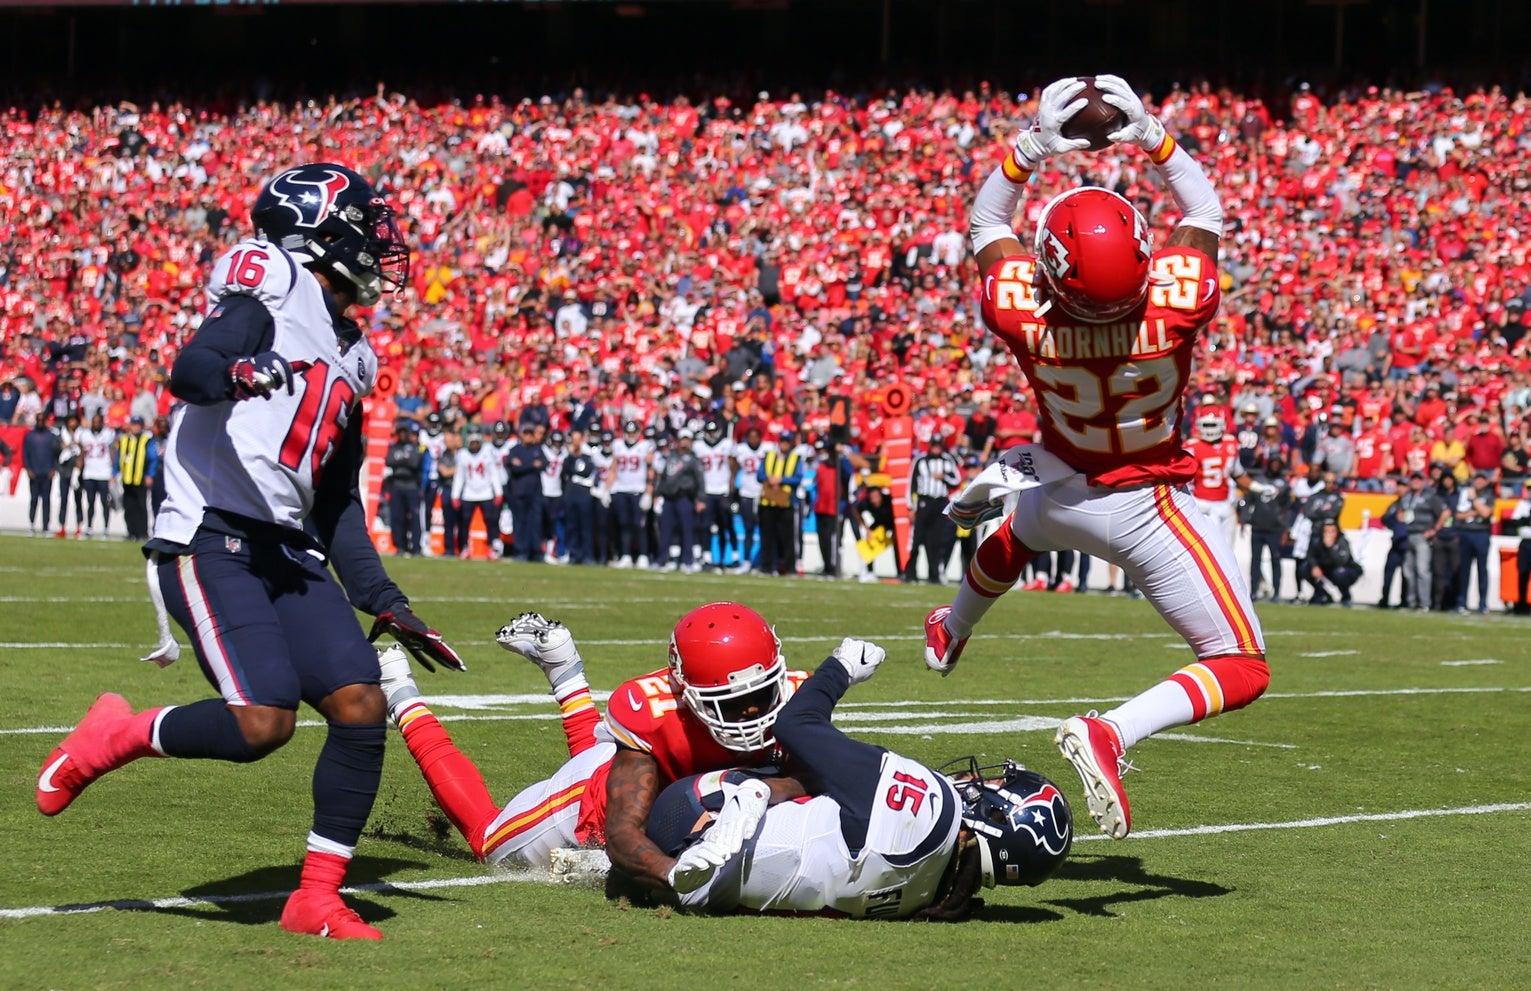 Chiefs derrota a Texans y clasifica a final de conferencia ante Titans